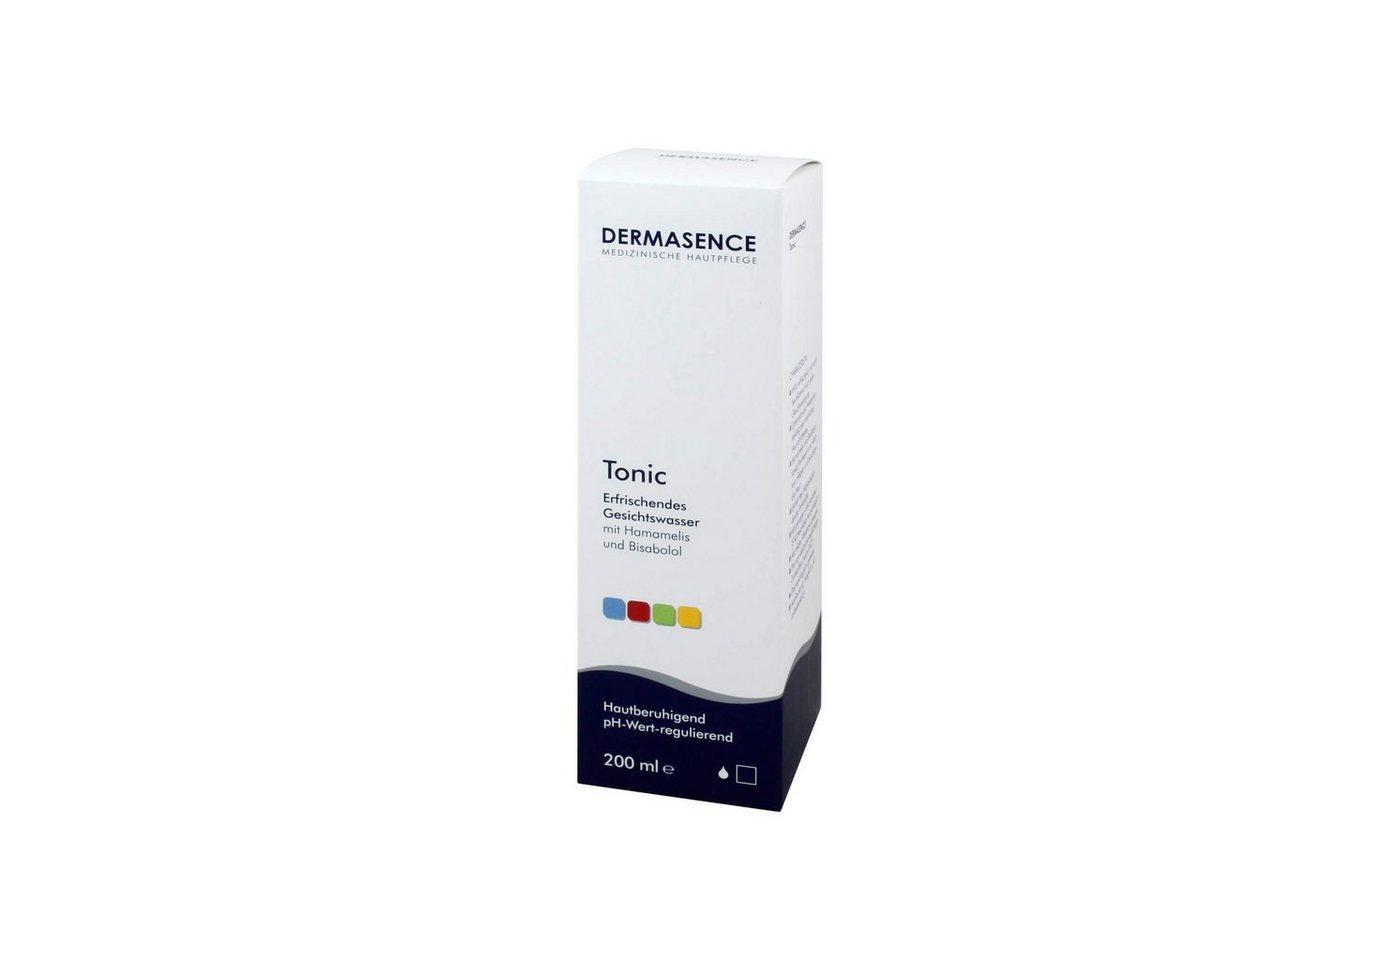 Dermasence Tonic, 200 ml